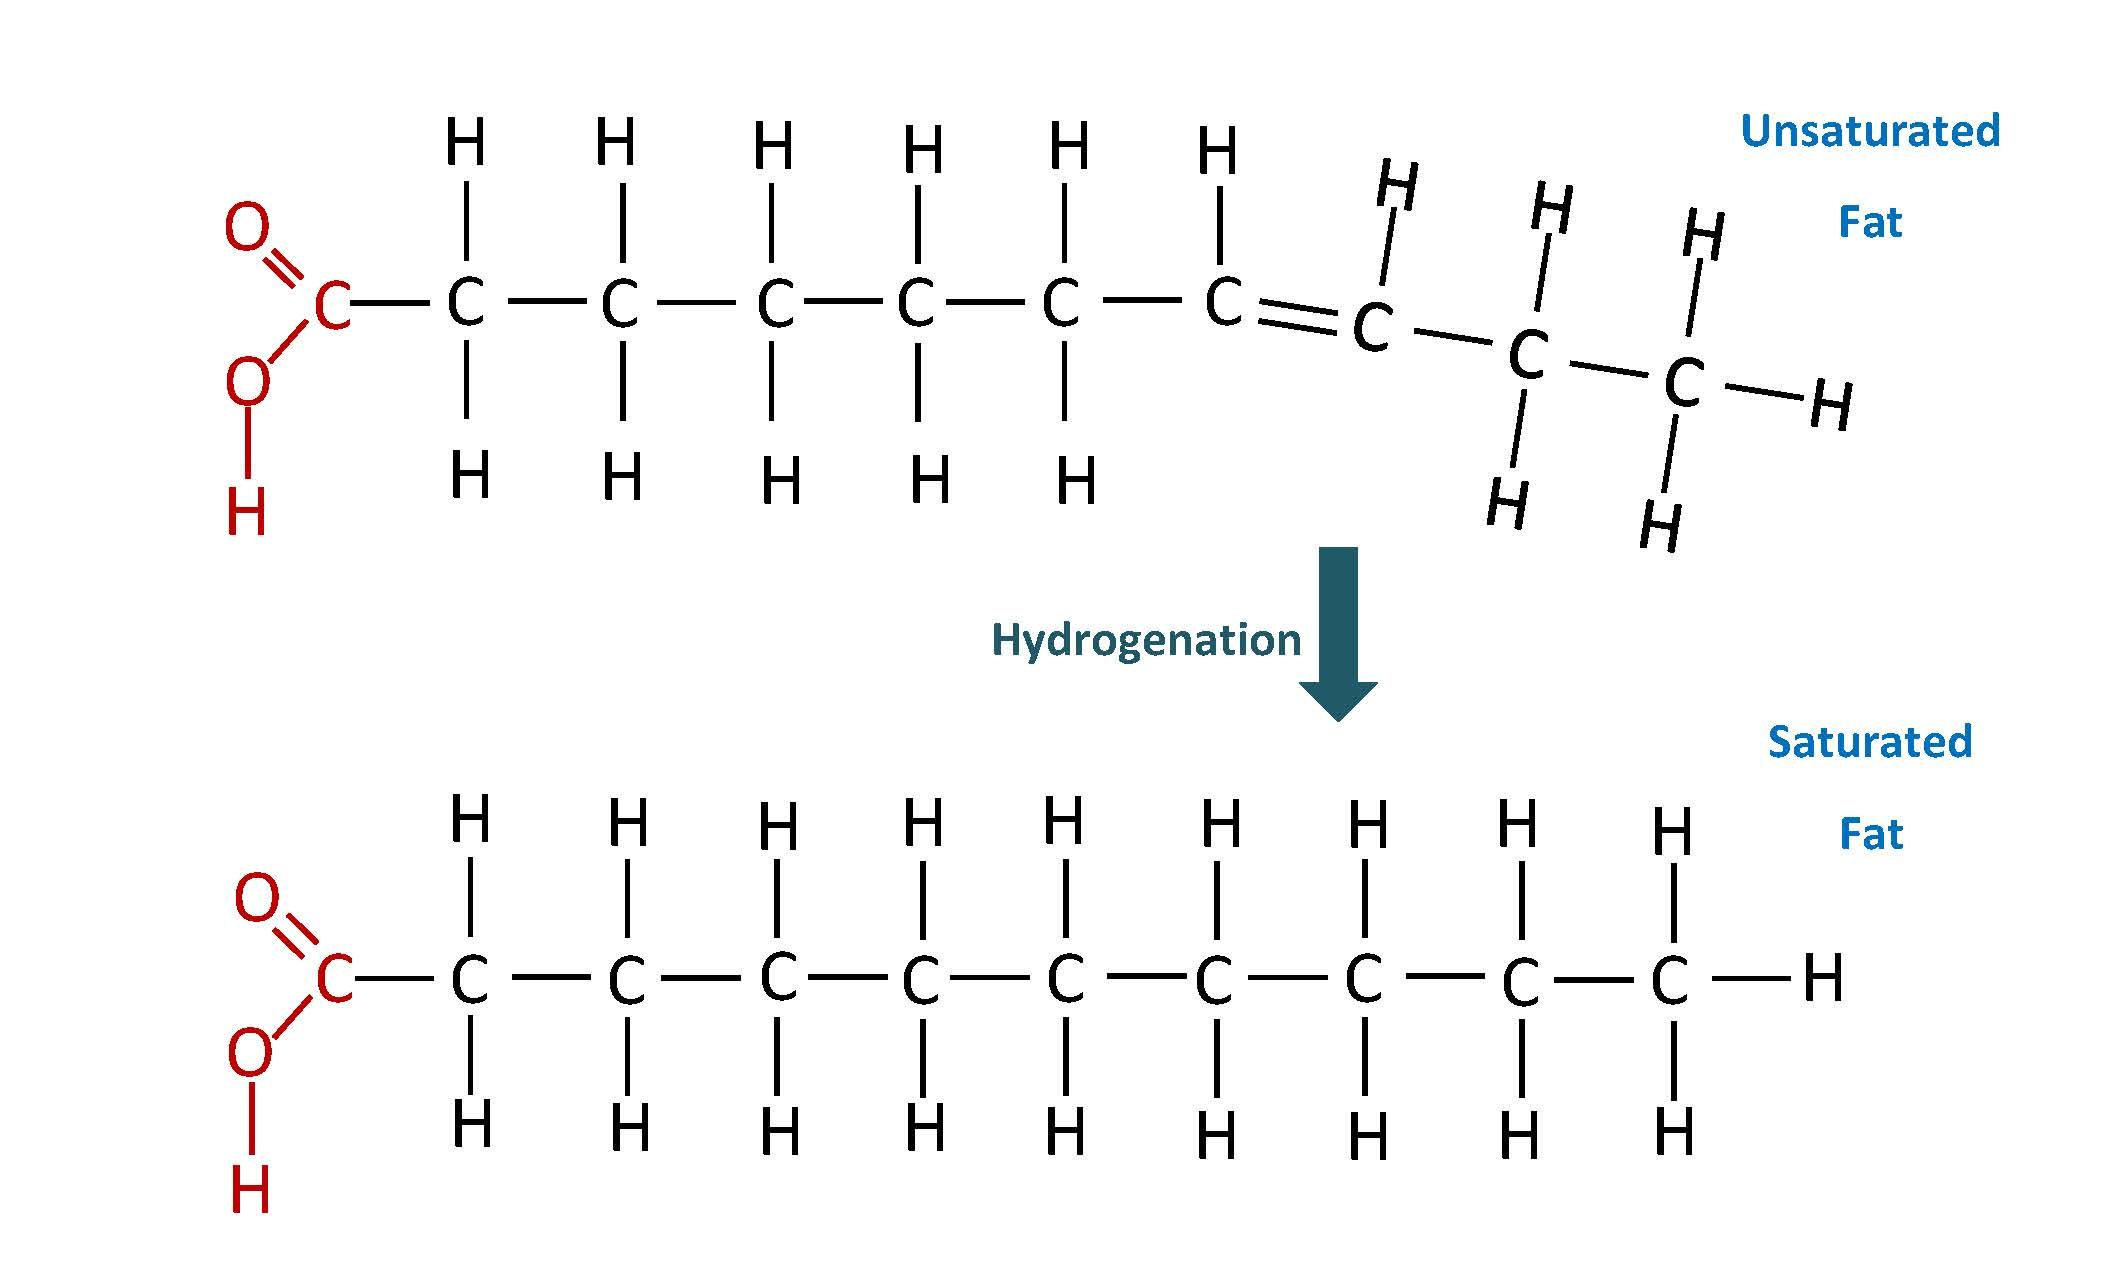 Fat Structure Diagram 2004 Pontiac Grand Prix Starter Wiring Of Unsaturated Lipids Foods Pinterest Food